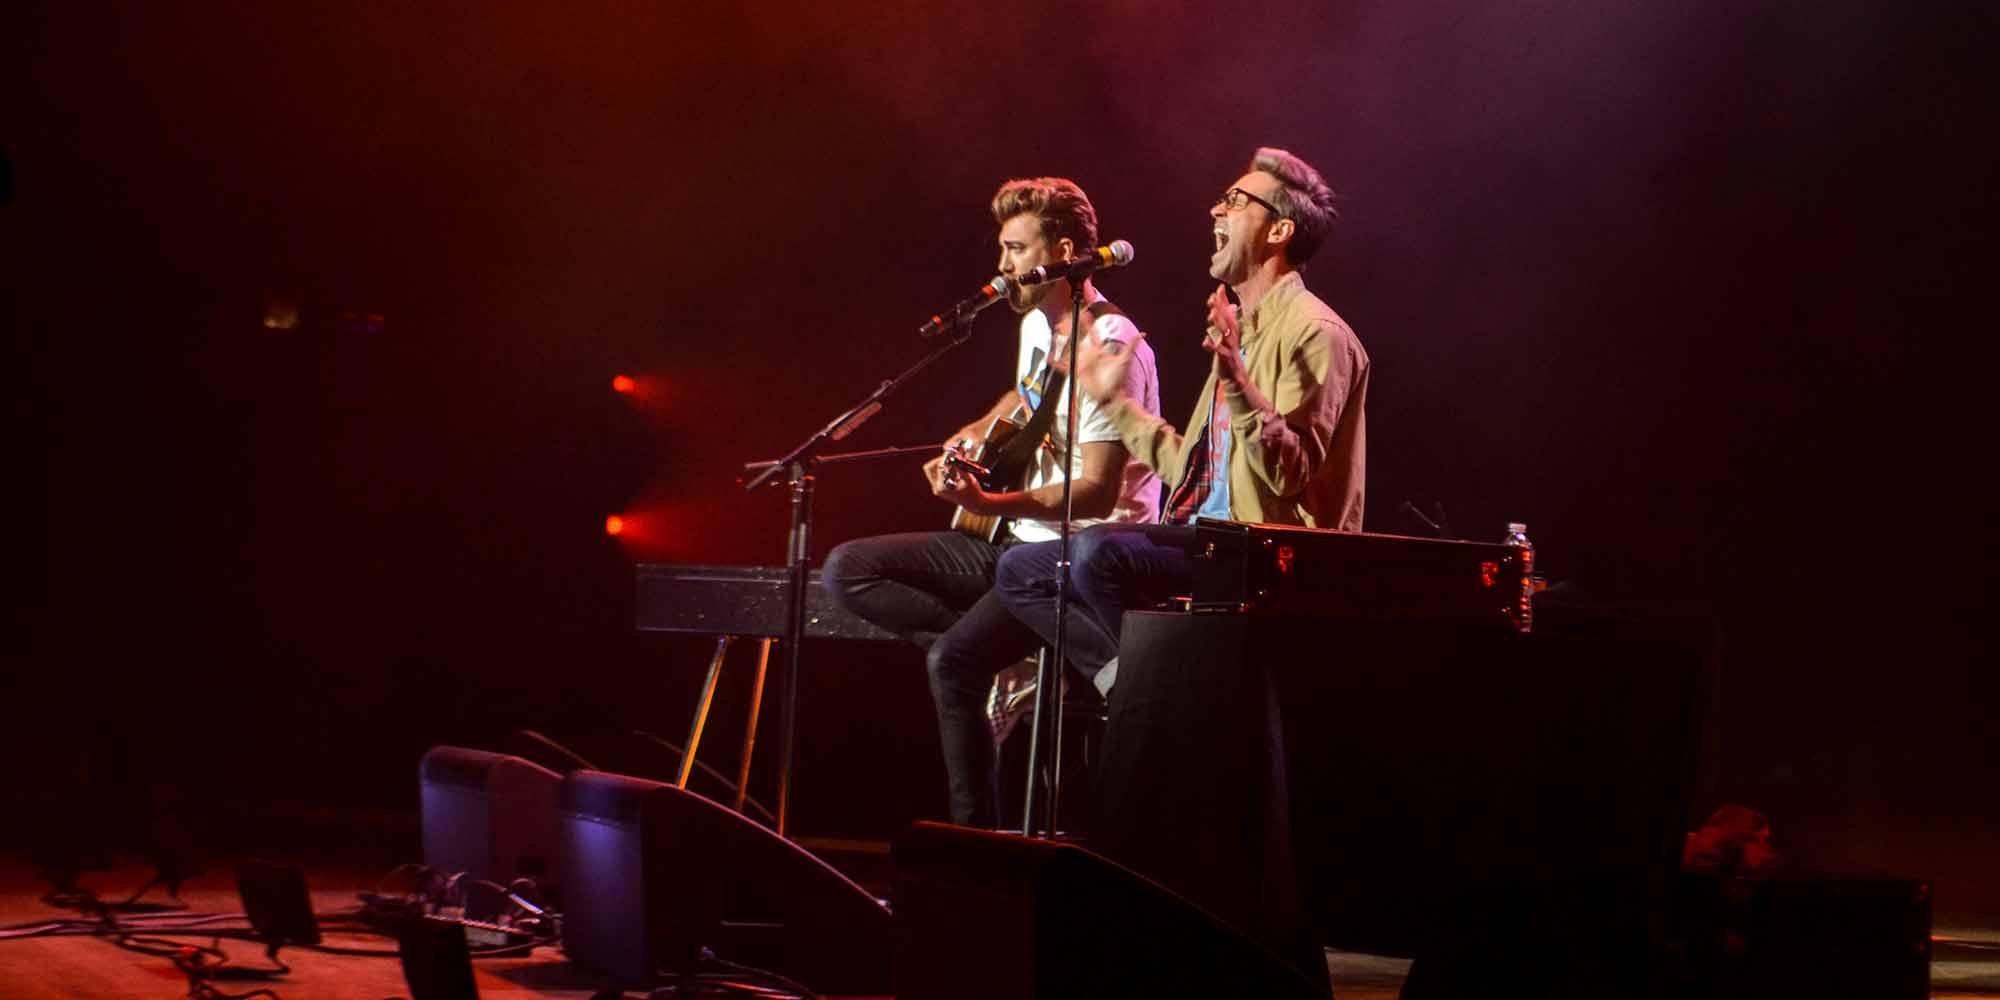 Rhett and Link Minneapolis